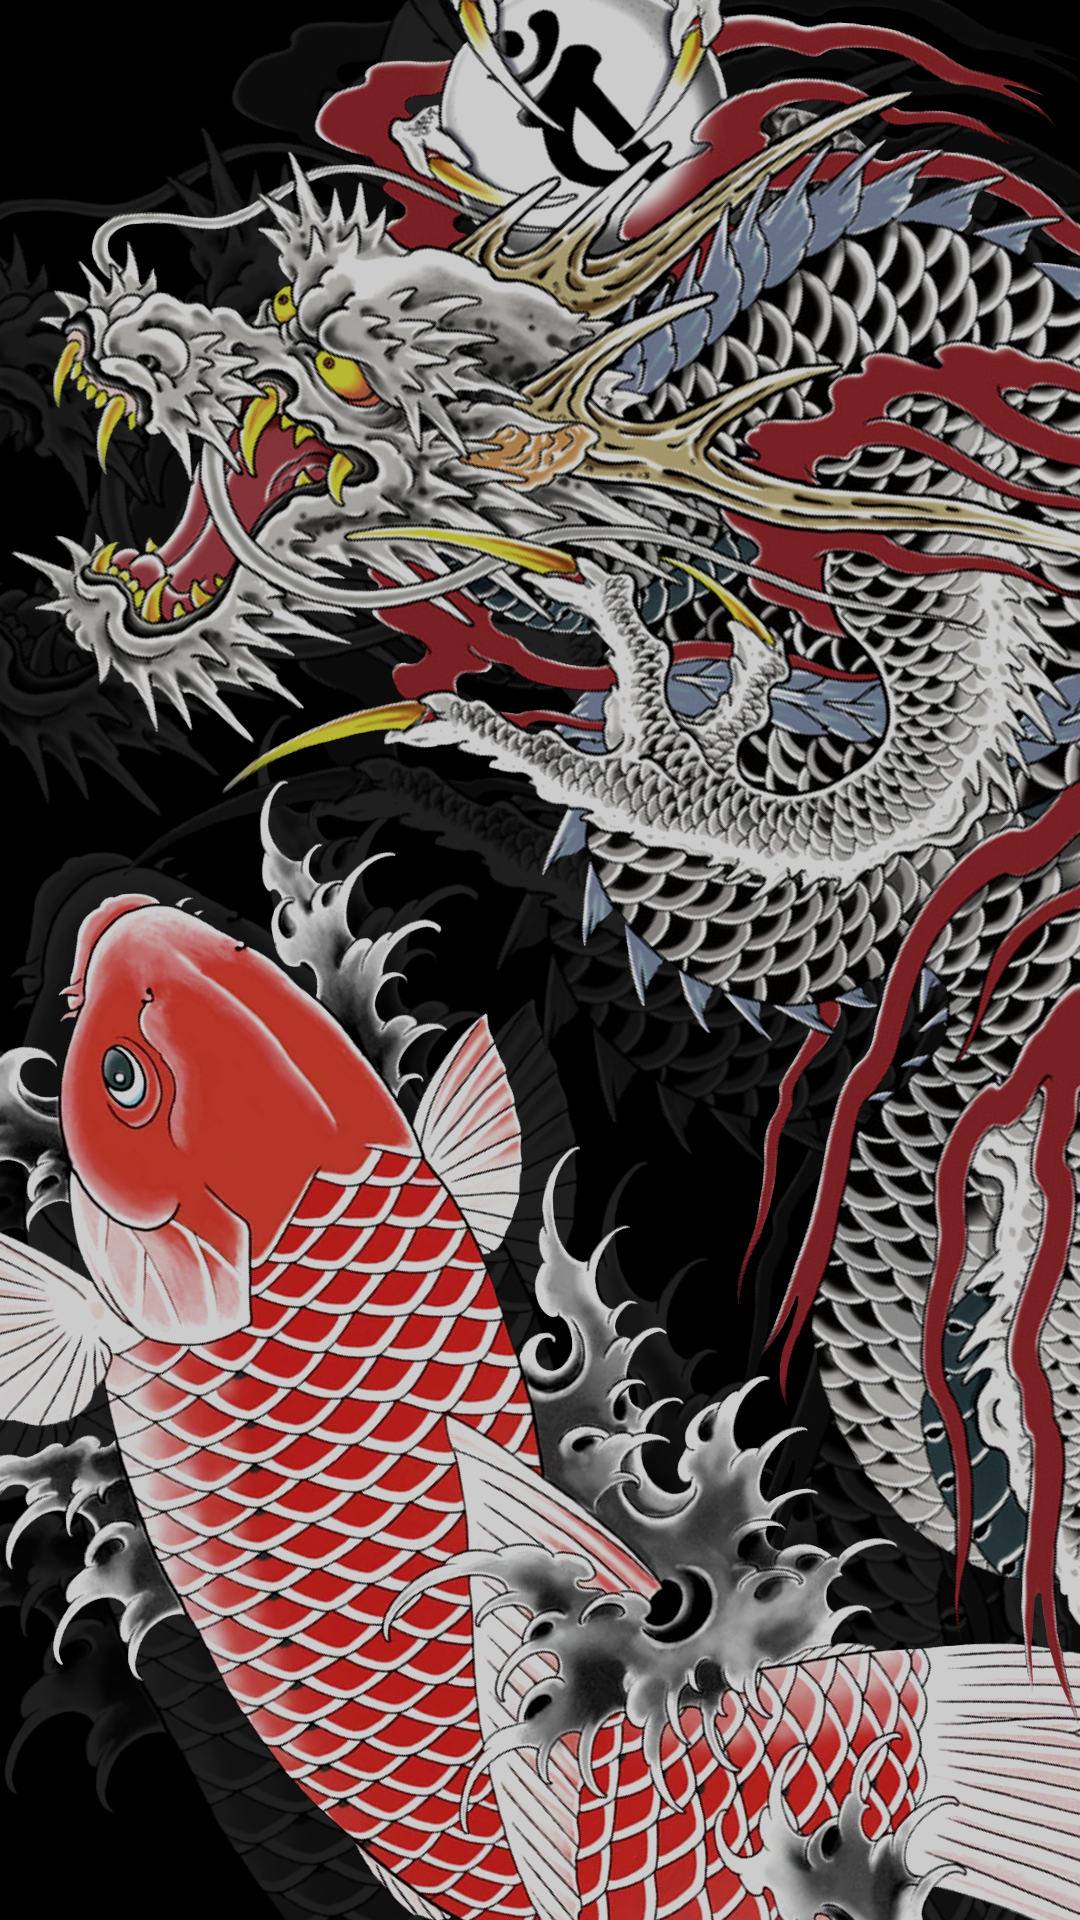 yakuza kiwami wallpaper Pesquisa Google